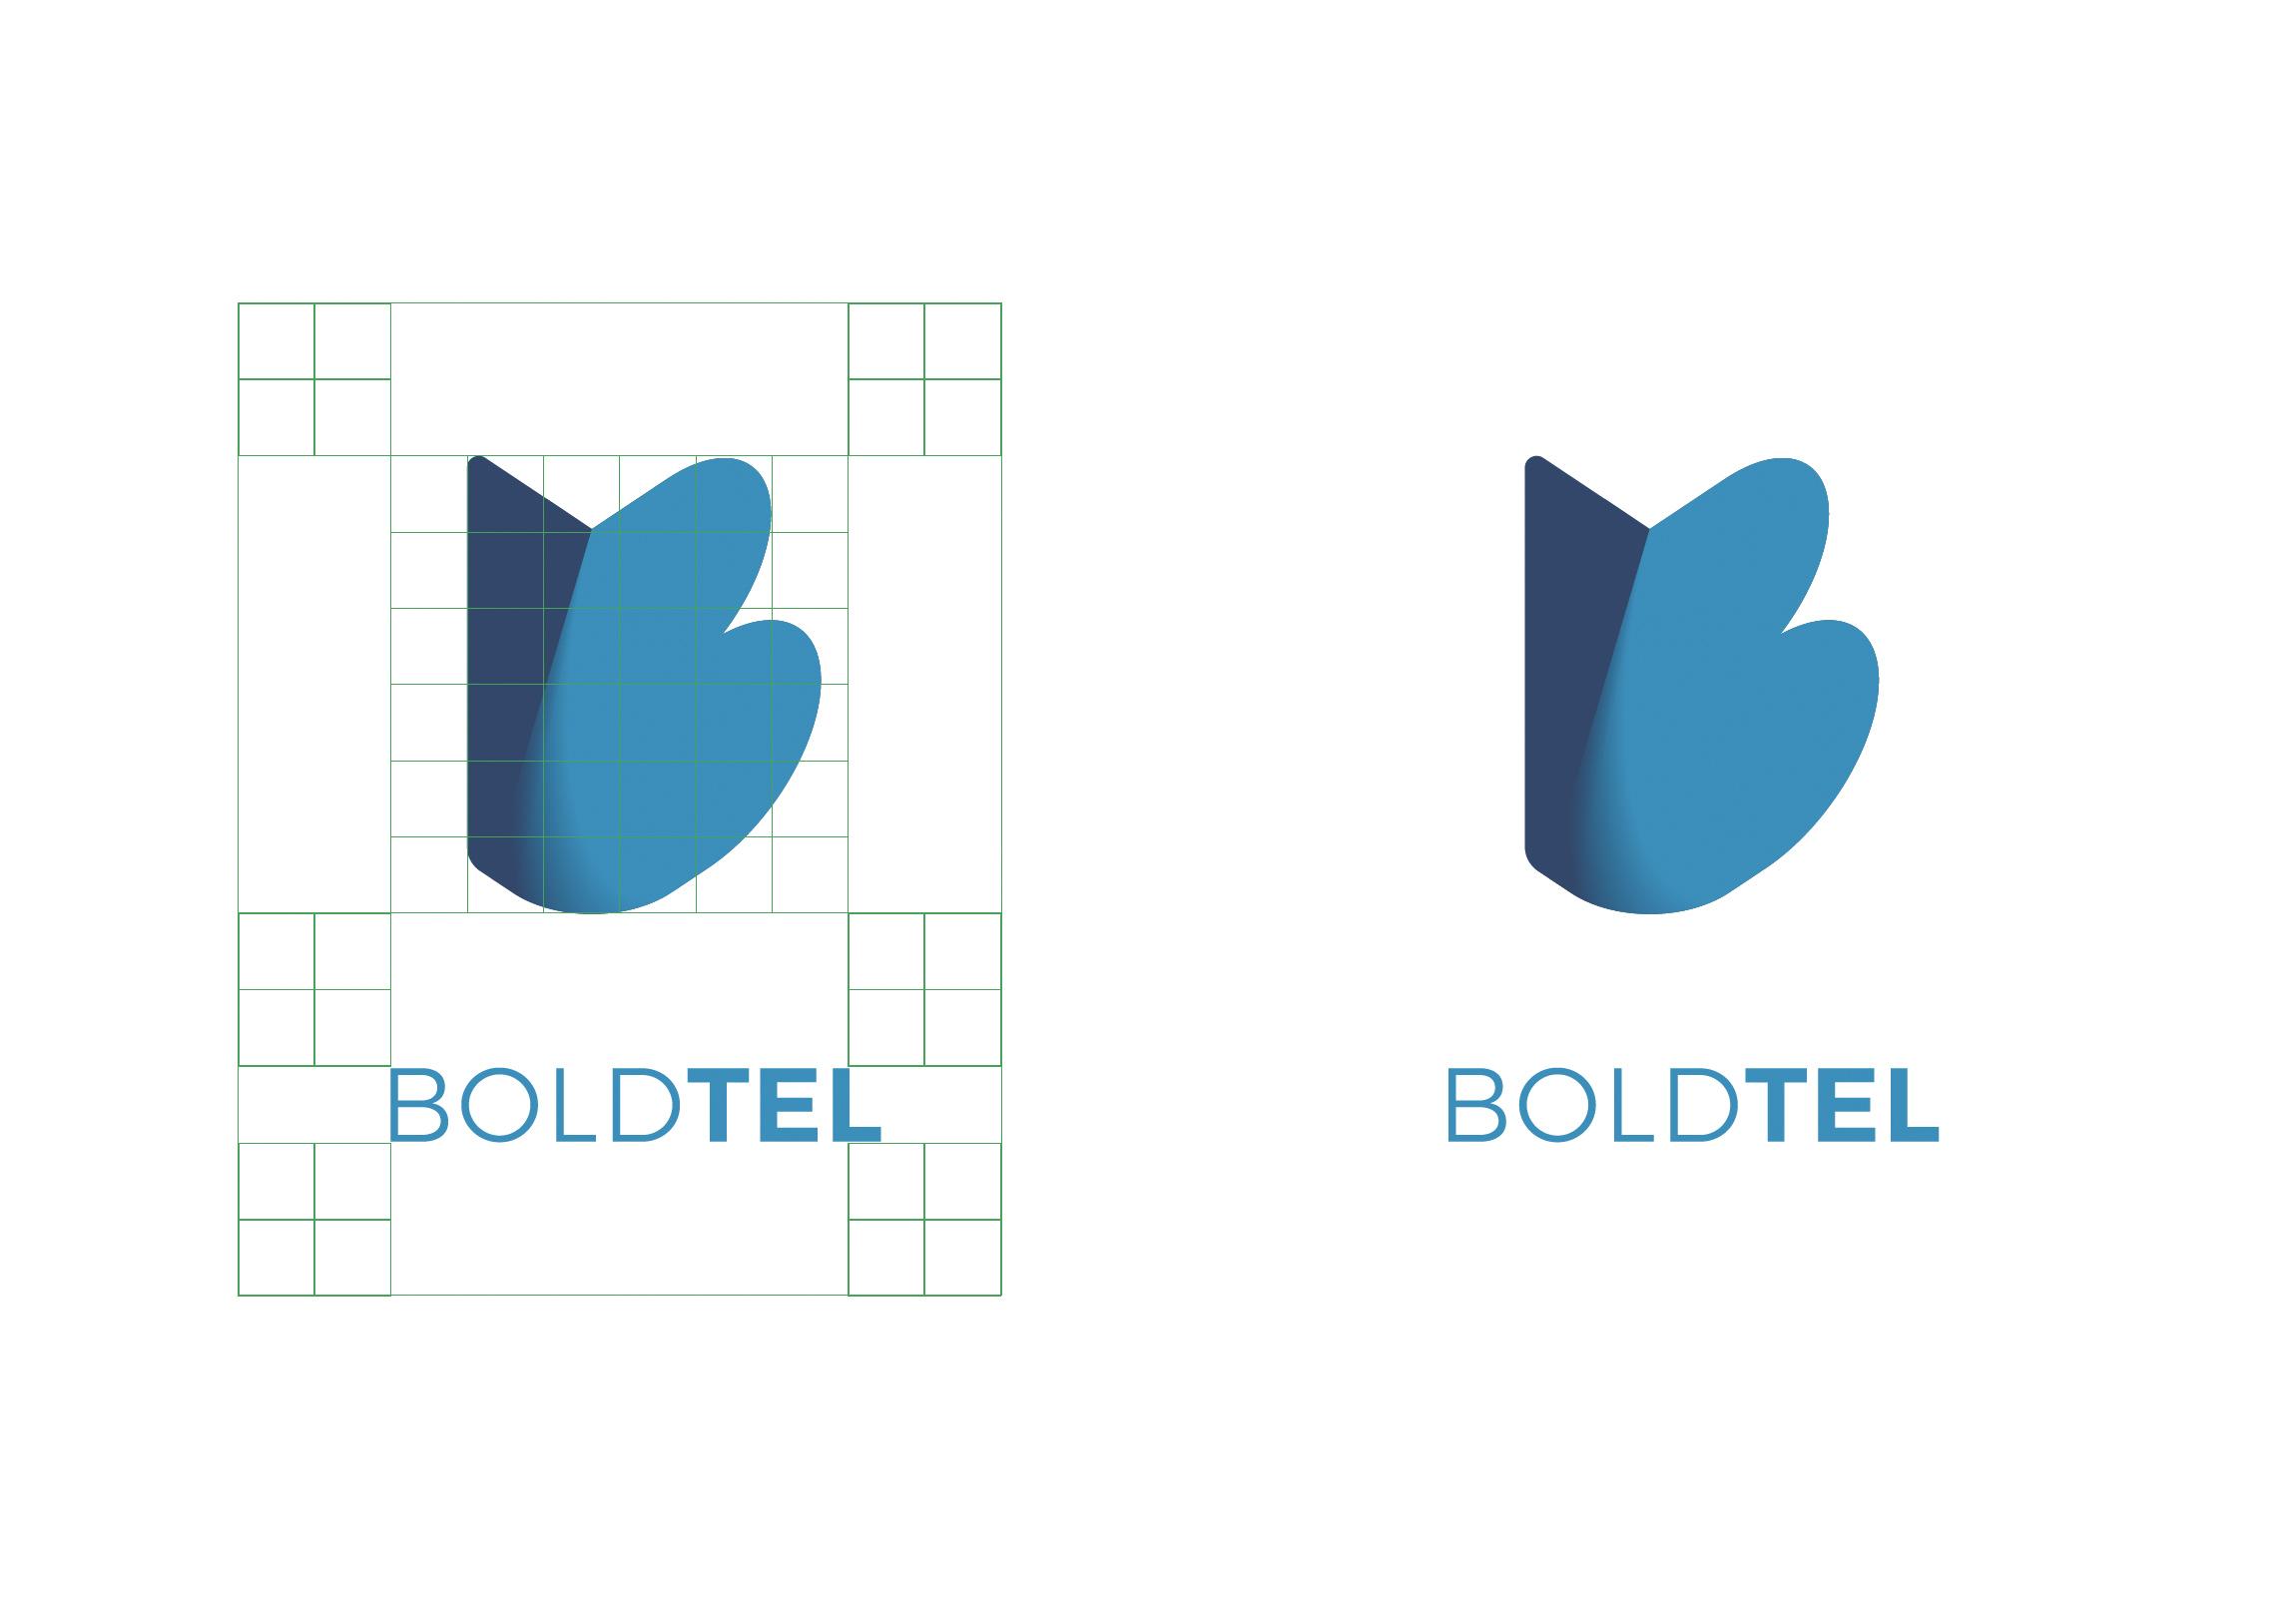 boldtel_gal_03.jpg